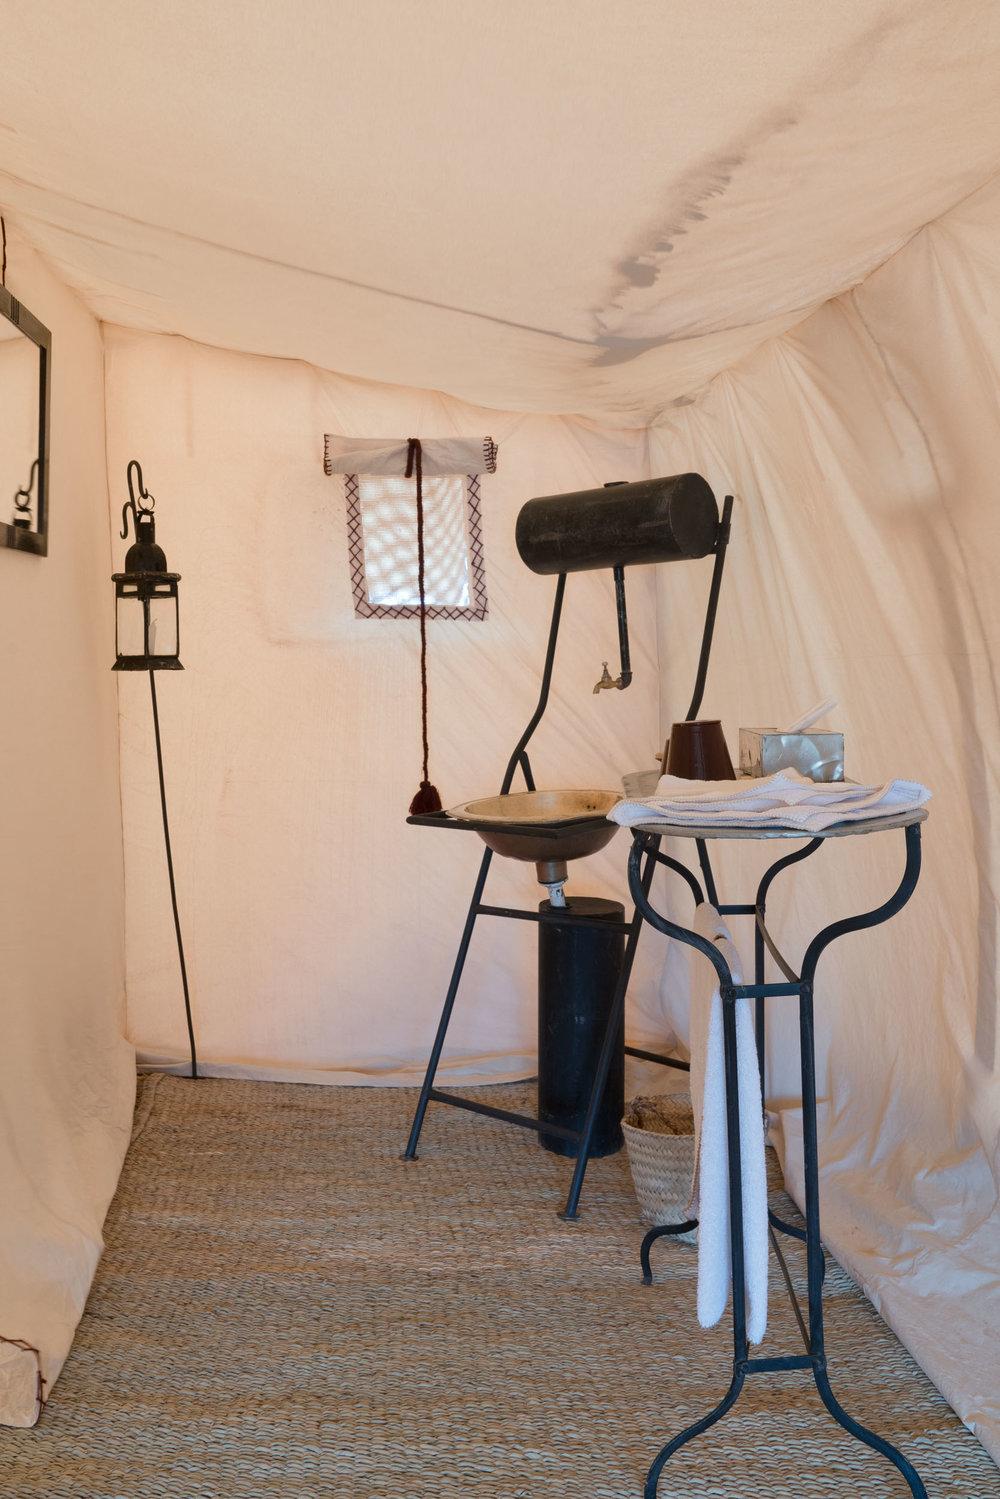 the_getaway_edit_morocco_dar_ahlam_sahara_desert-18.jpg